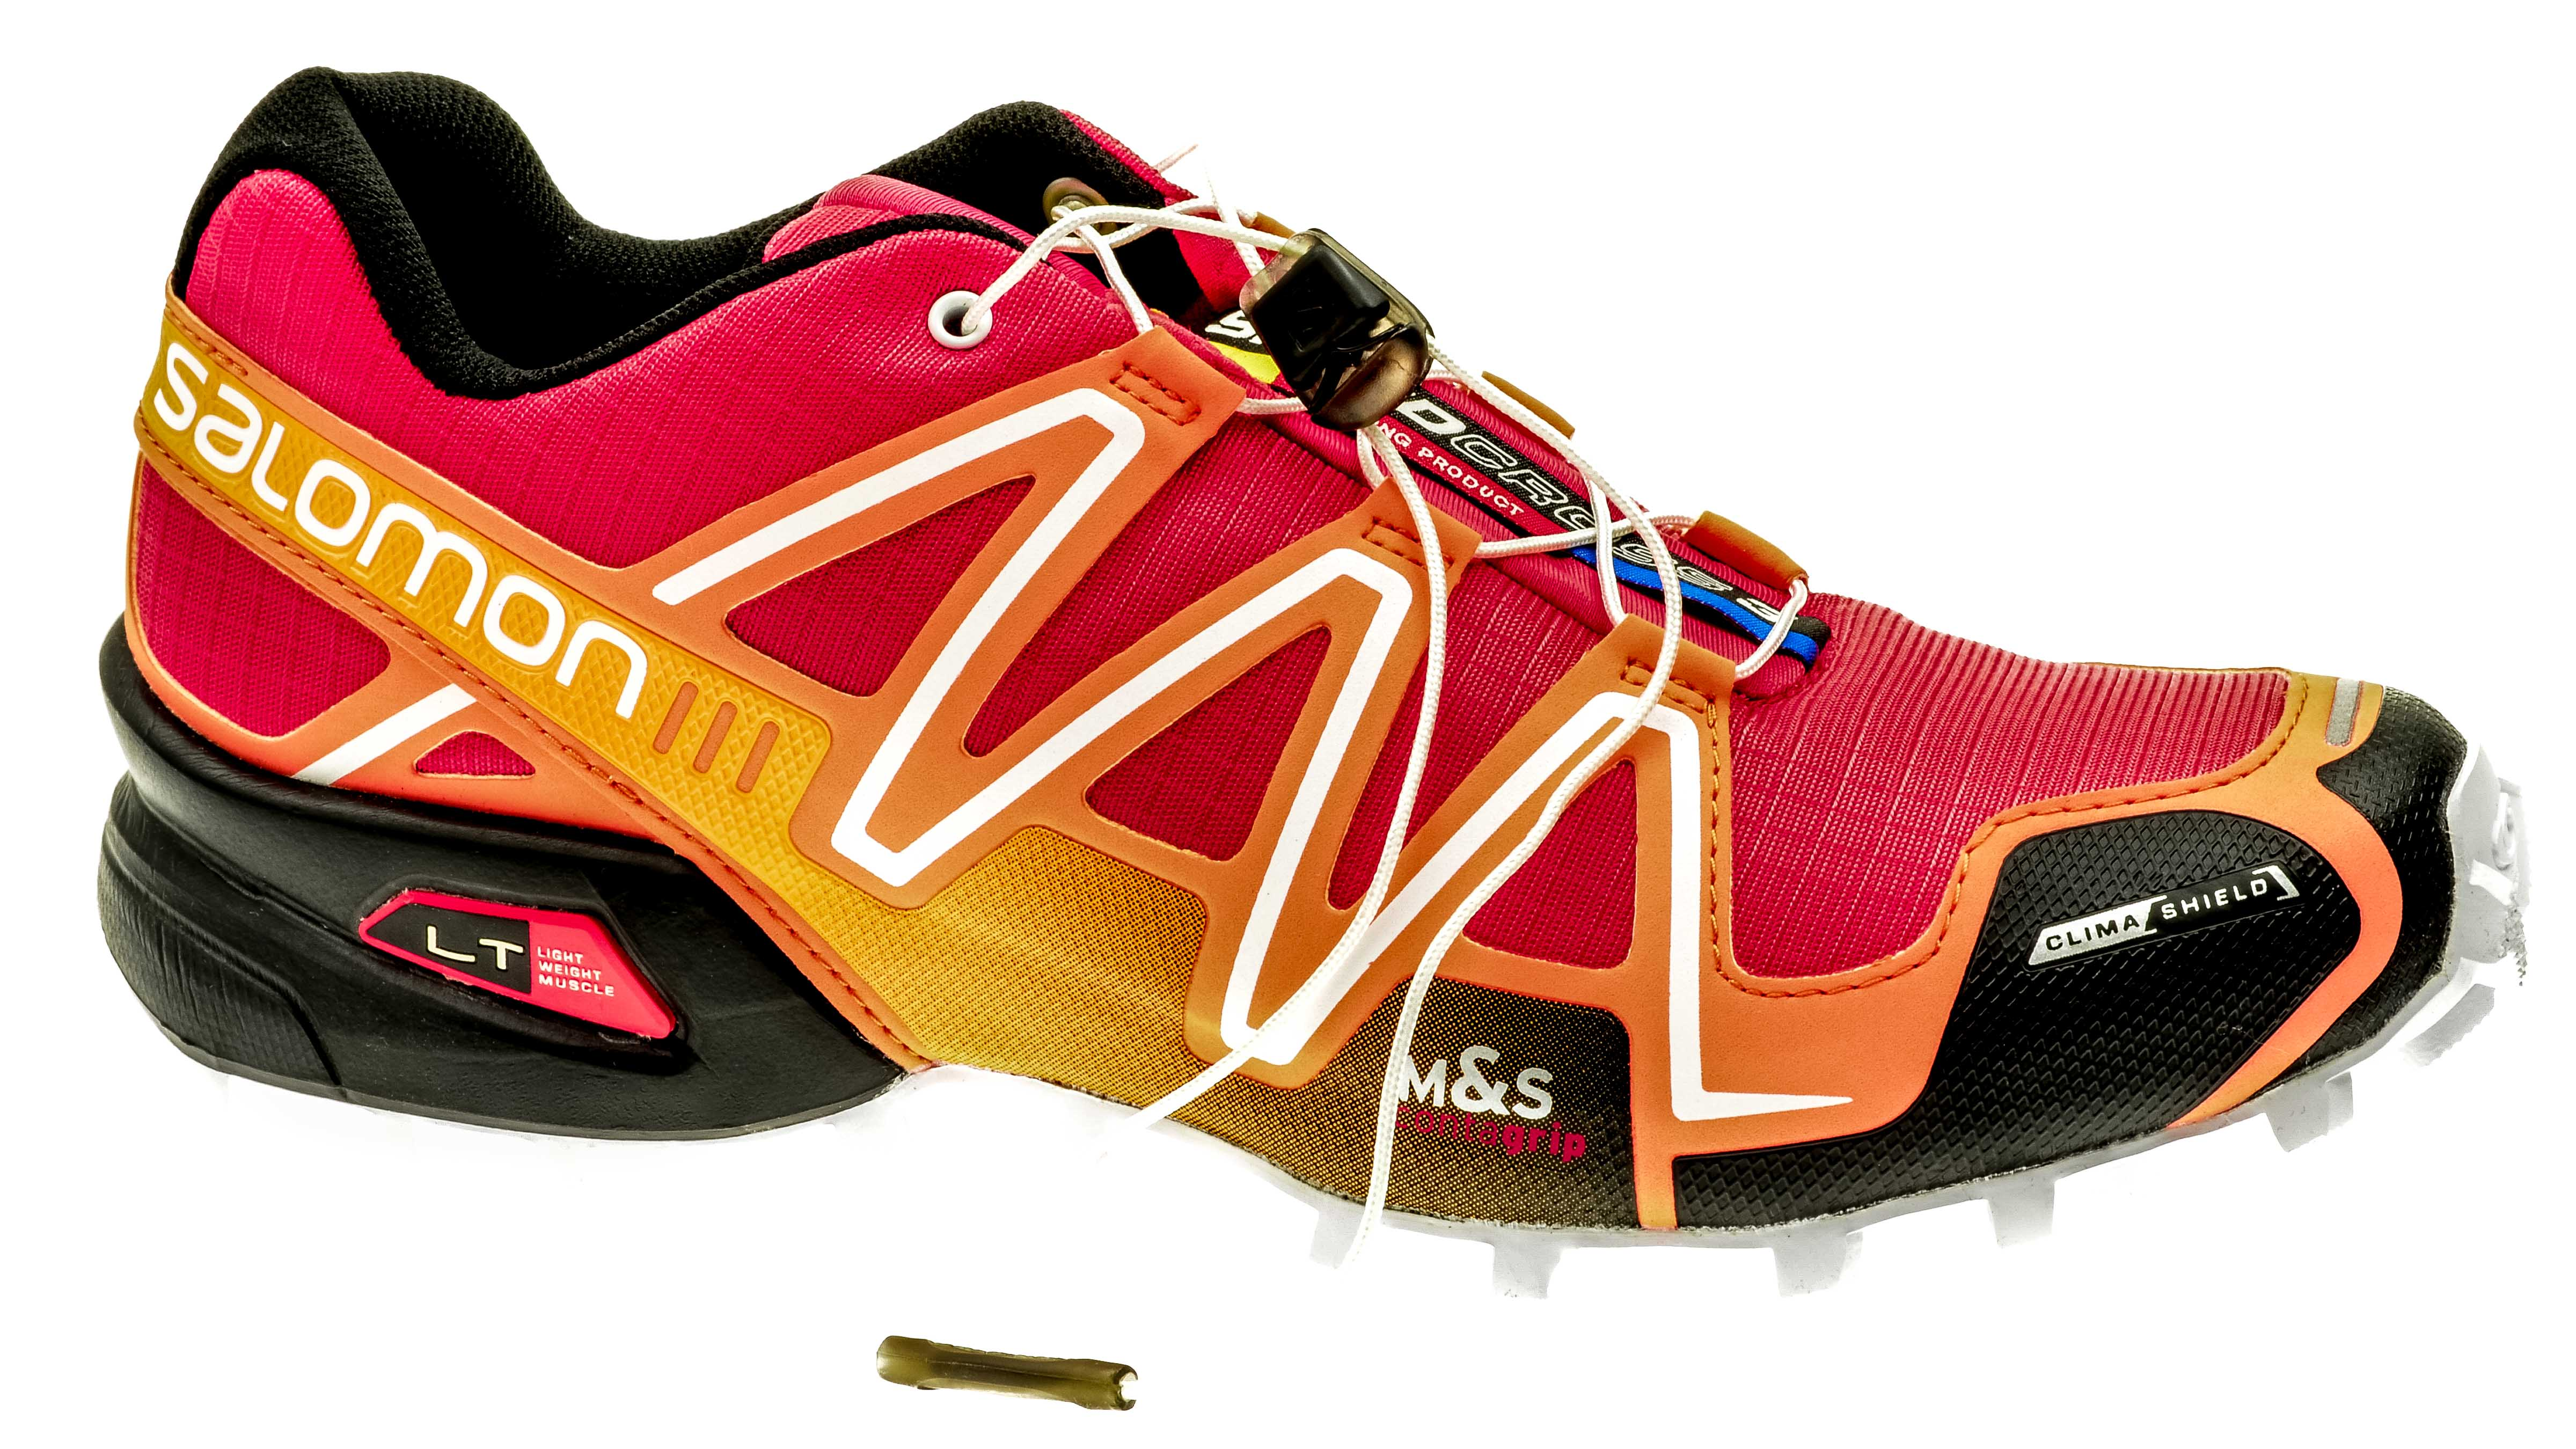 online store 571a0 1fc44 Salomon Speedcross 3 CS papaya-b/orange-feeling/black